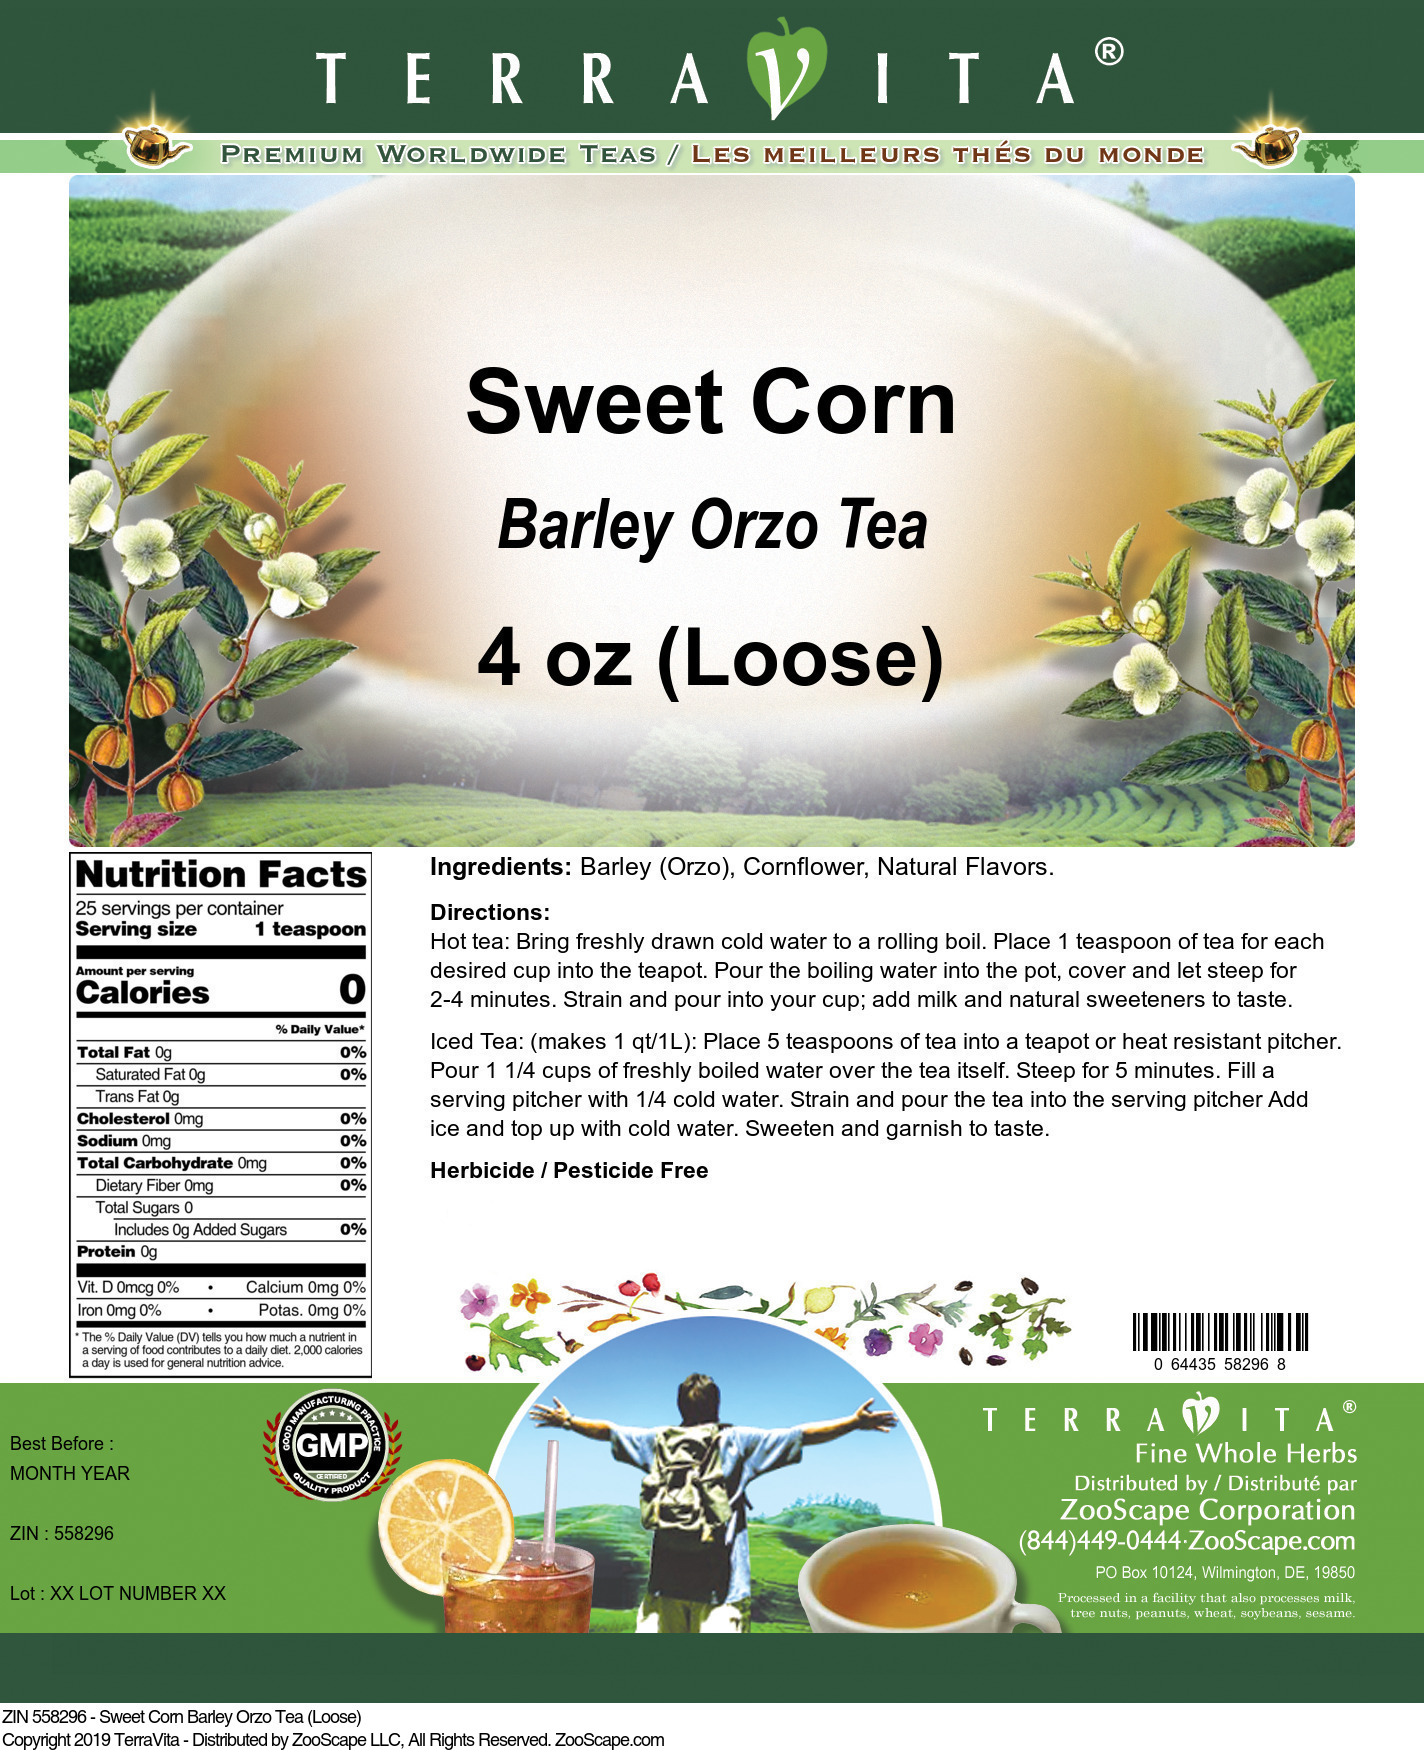 Sweet Corn Barley Orzo Tea (Loose)